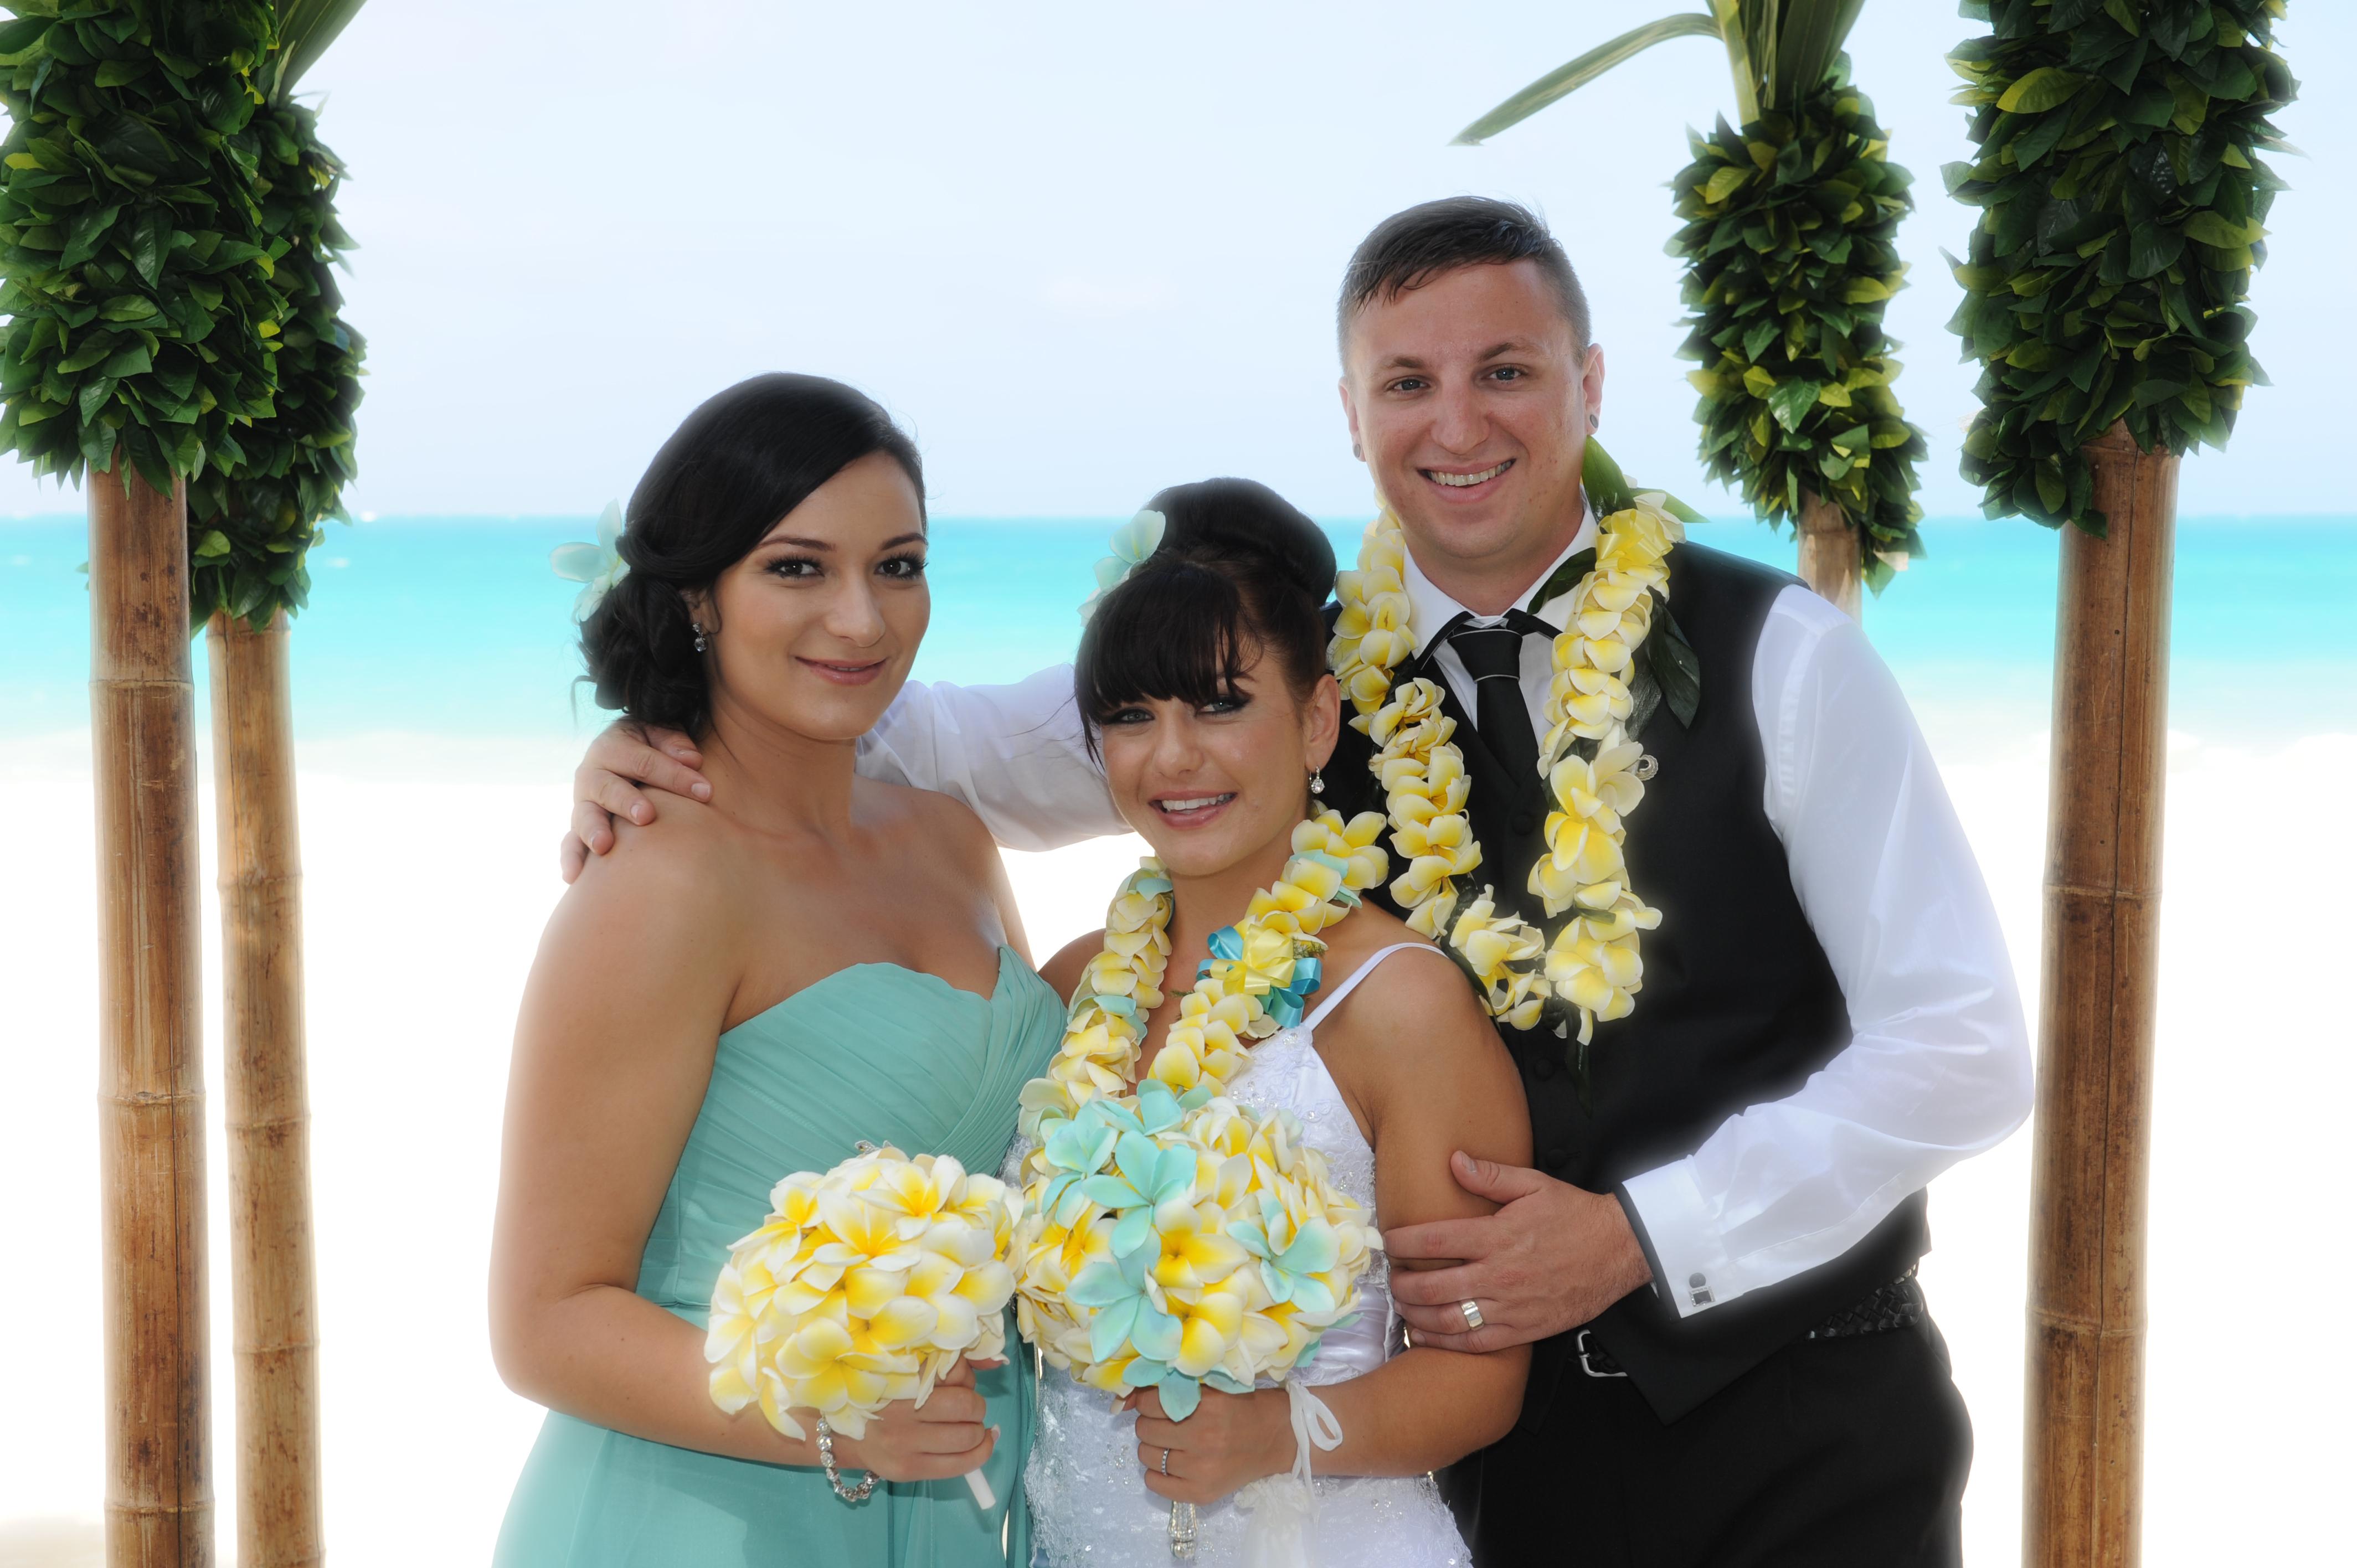 Alohaislandweddings.com- Wedding Picture in Hawaii-3